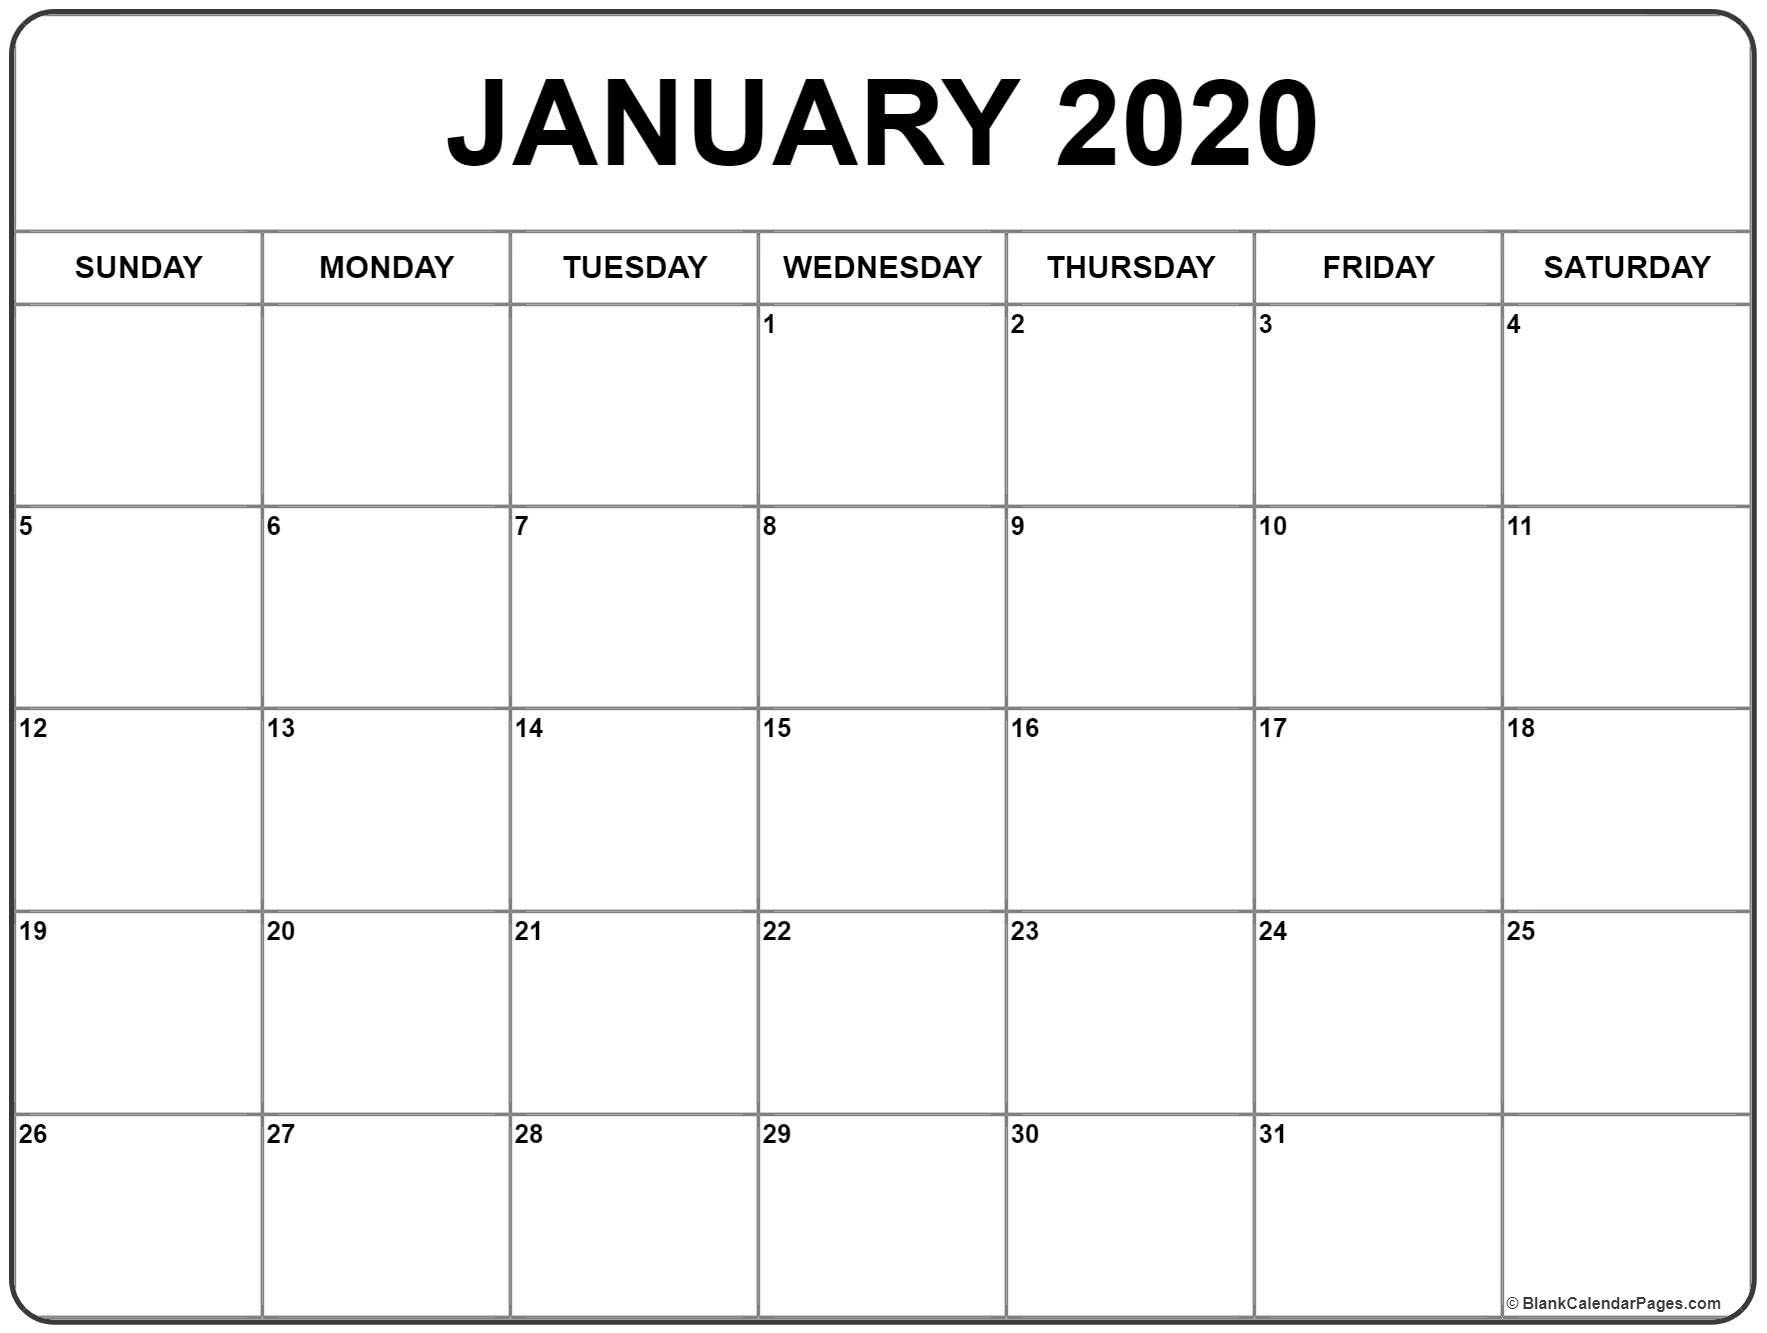 January 2020 Calendar | Free Printable Monthly Calendars with Free Printable 2020 Calendar With Space To Write